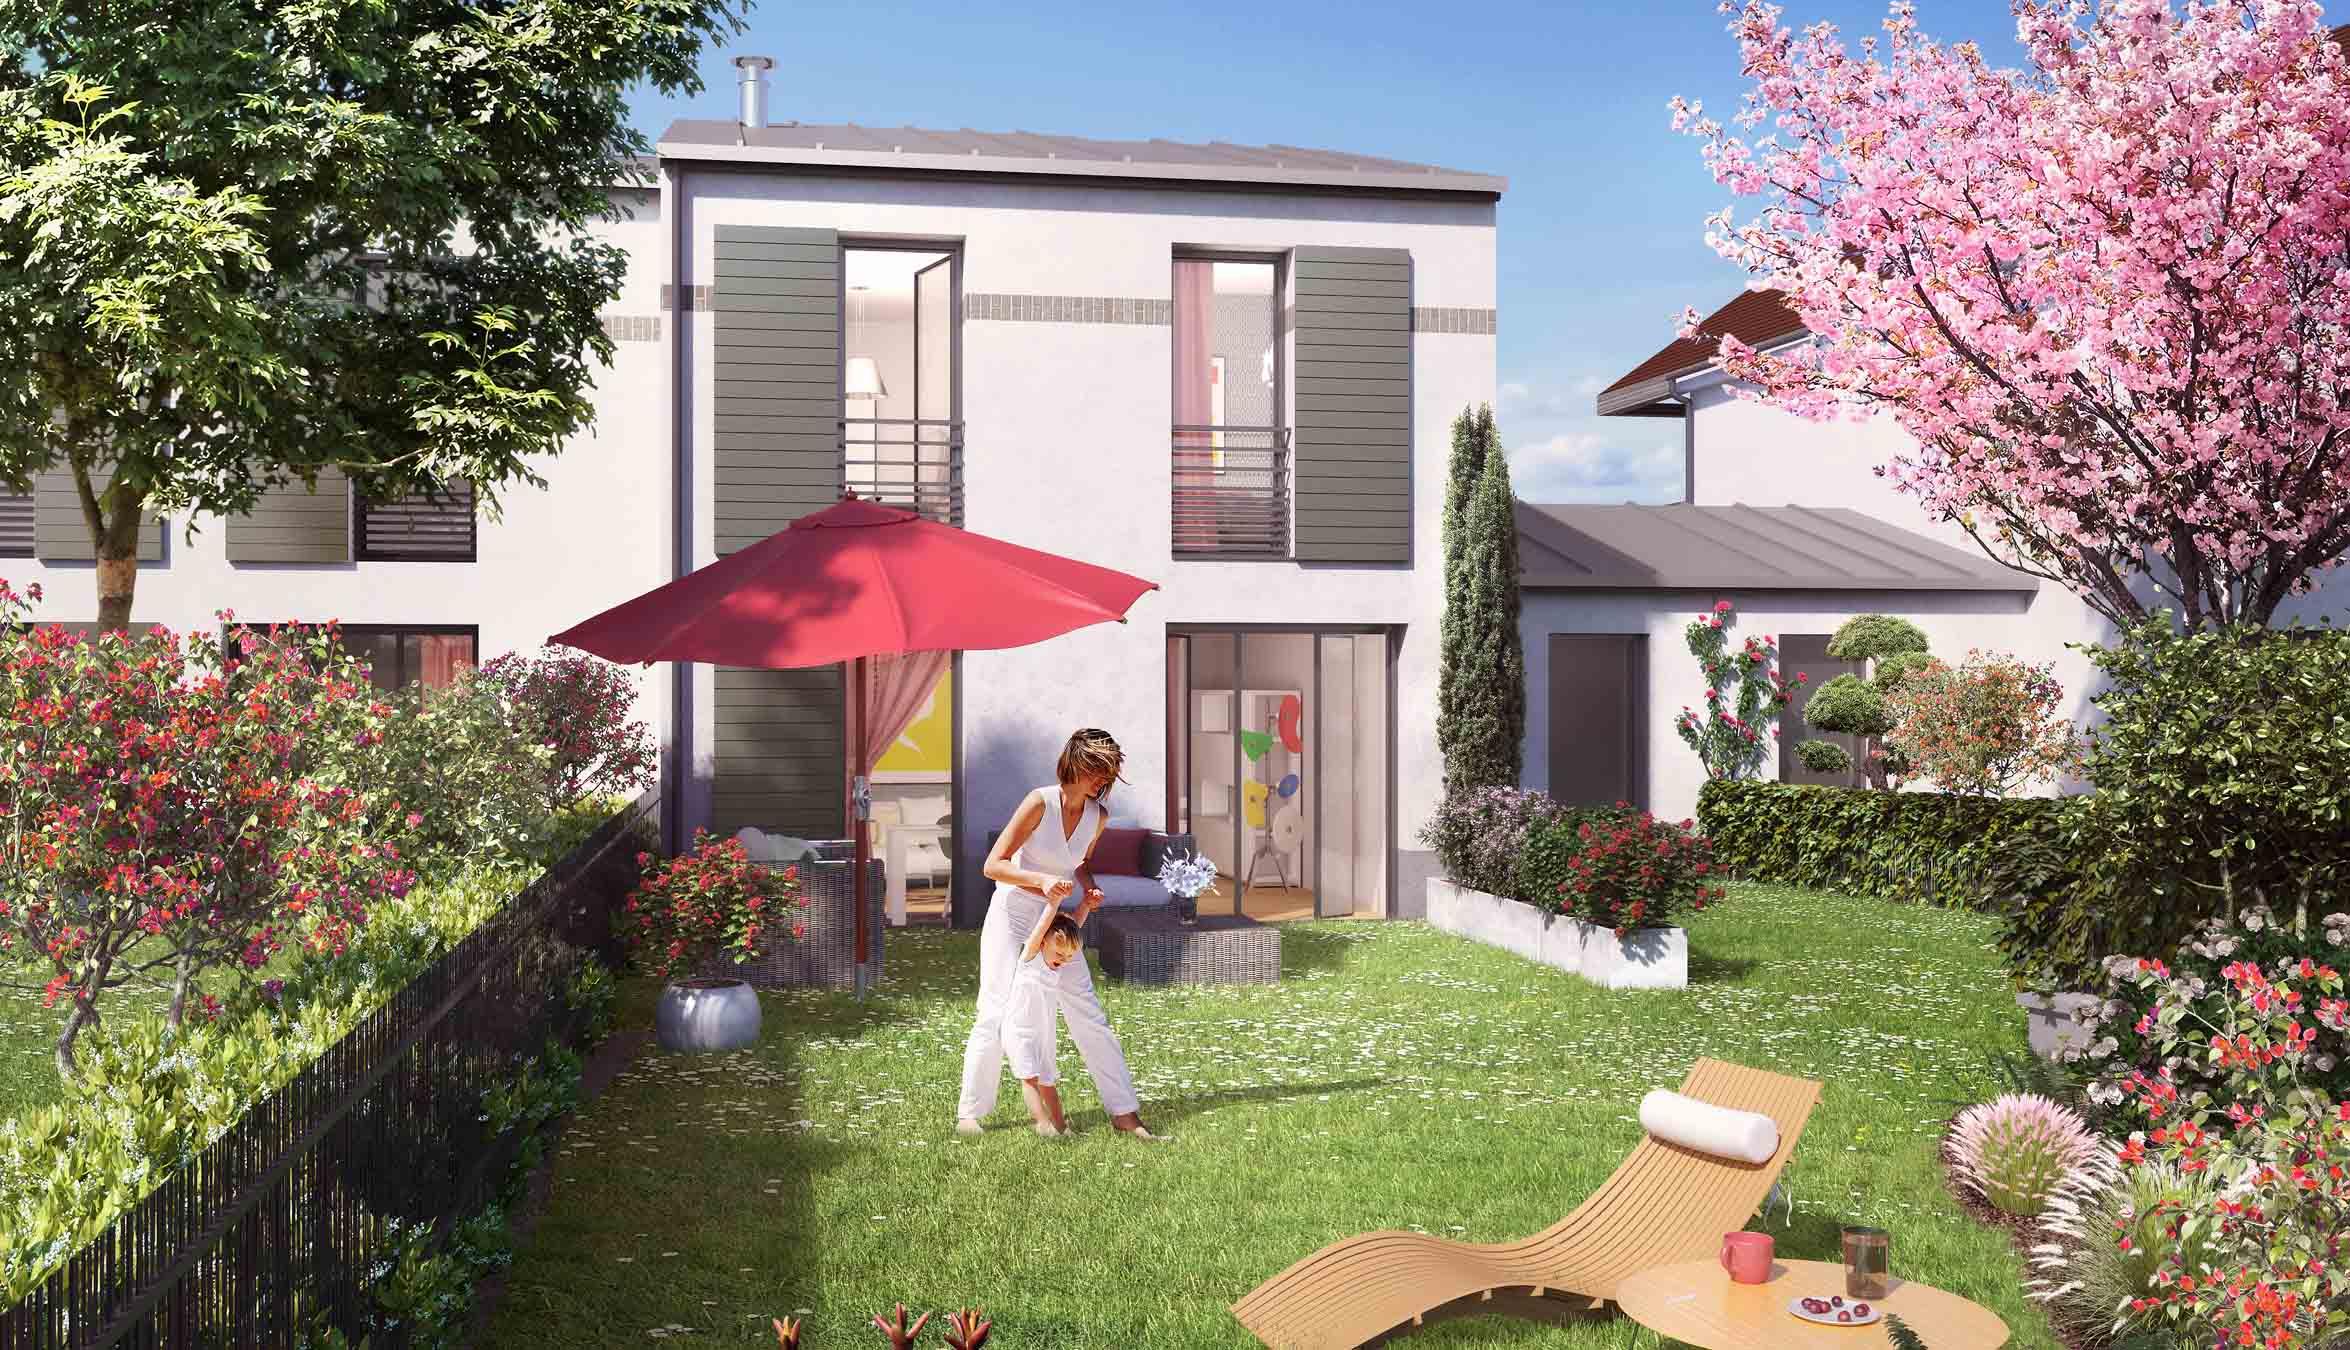 Villas Plaisance Programme Immobilier Neuf à LIsleAdam - Carrelage l'isle adam